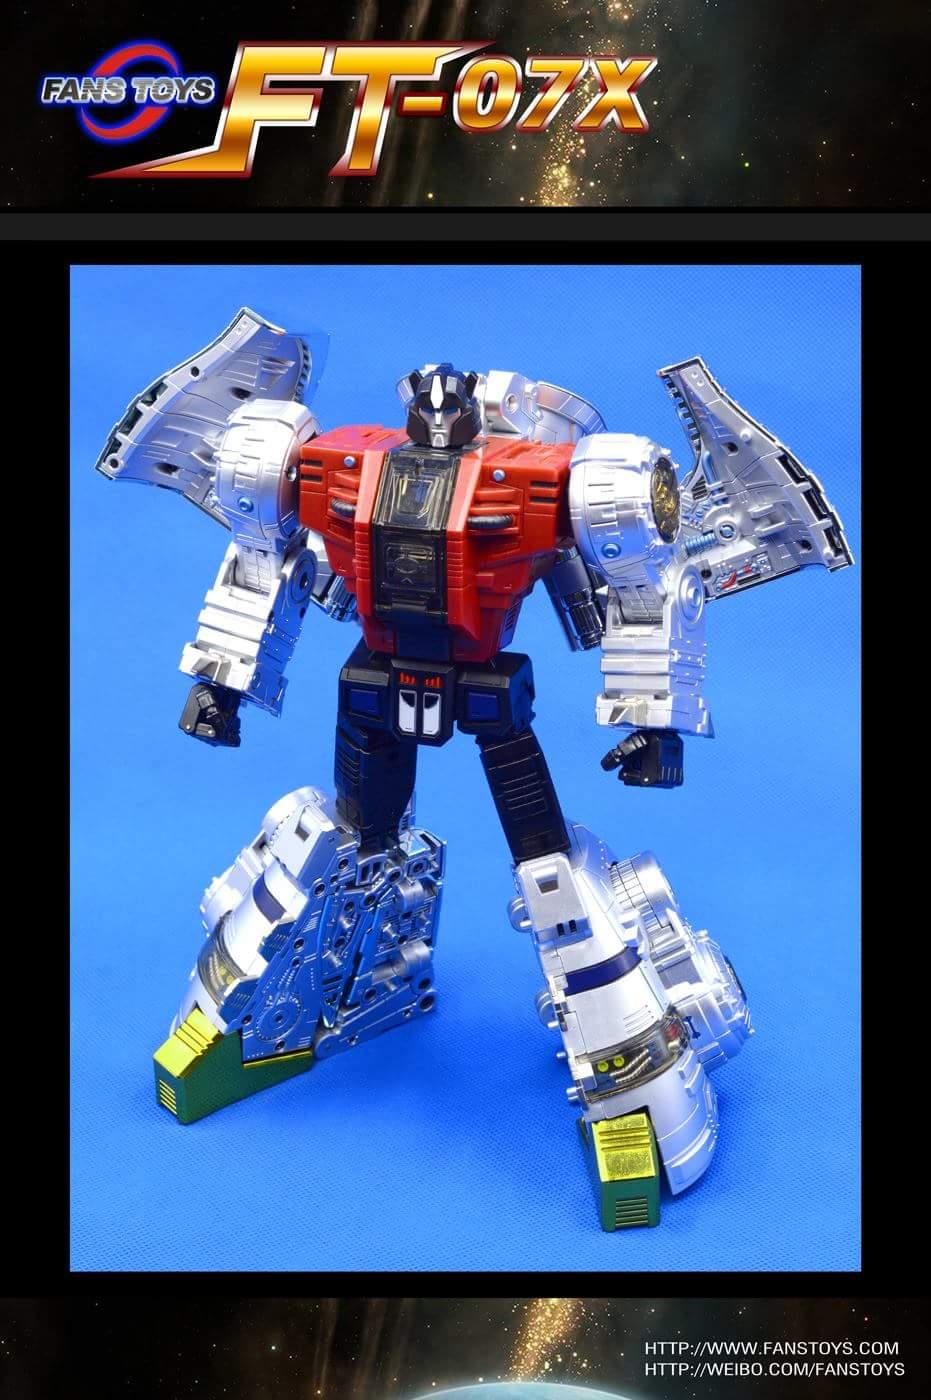 [Fanstoys] Produit Tiers - Dinobots - FT-04 Scoria, FT-05 Soar, FT-06 Sever, FT-07 Stomp, FT-08 Grinder - Page 9 XXuNtg0J